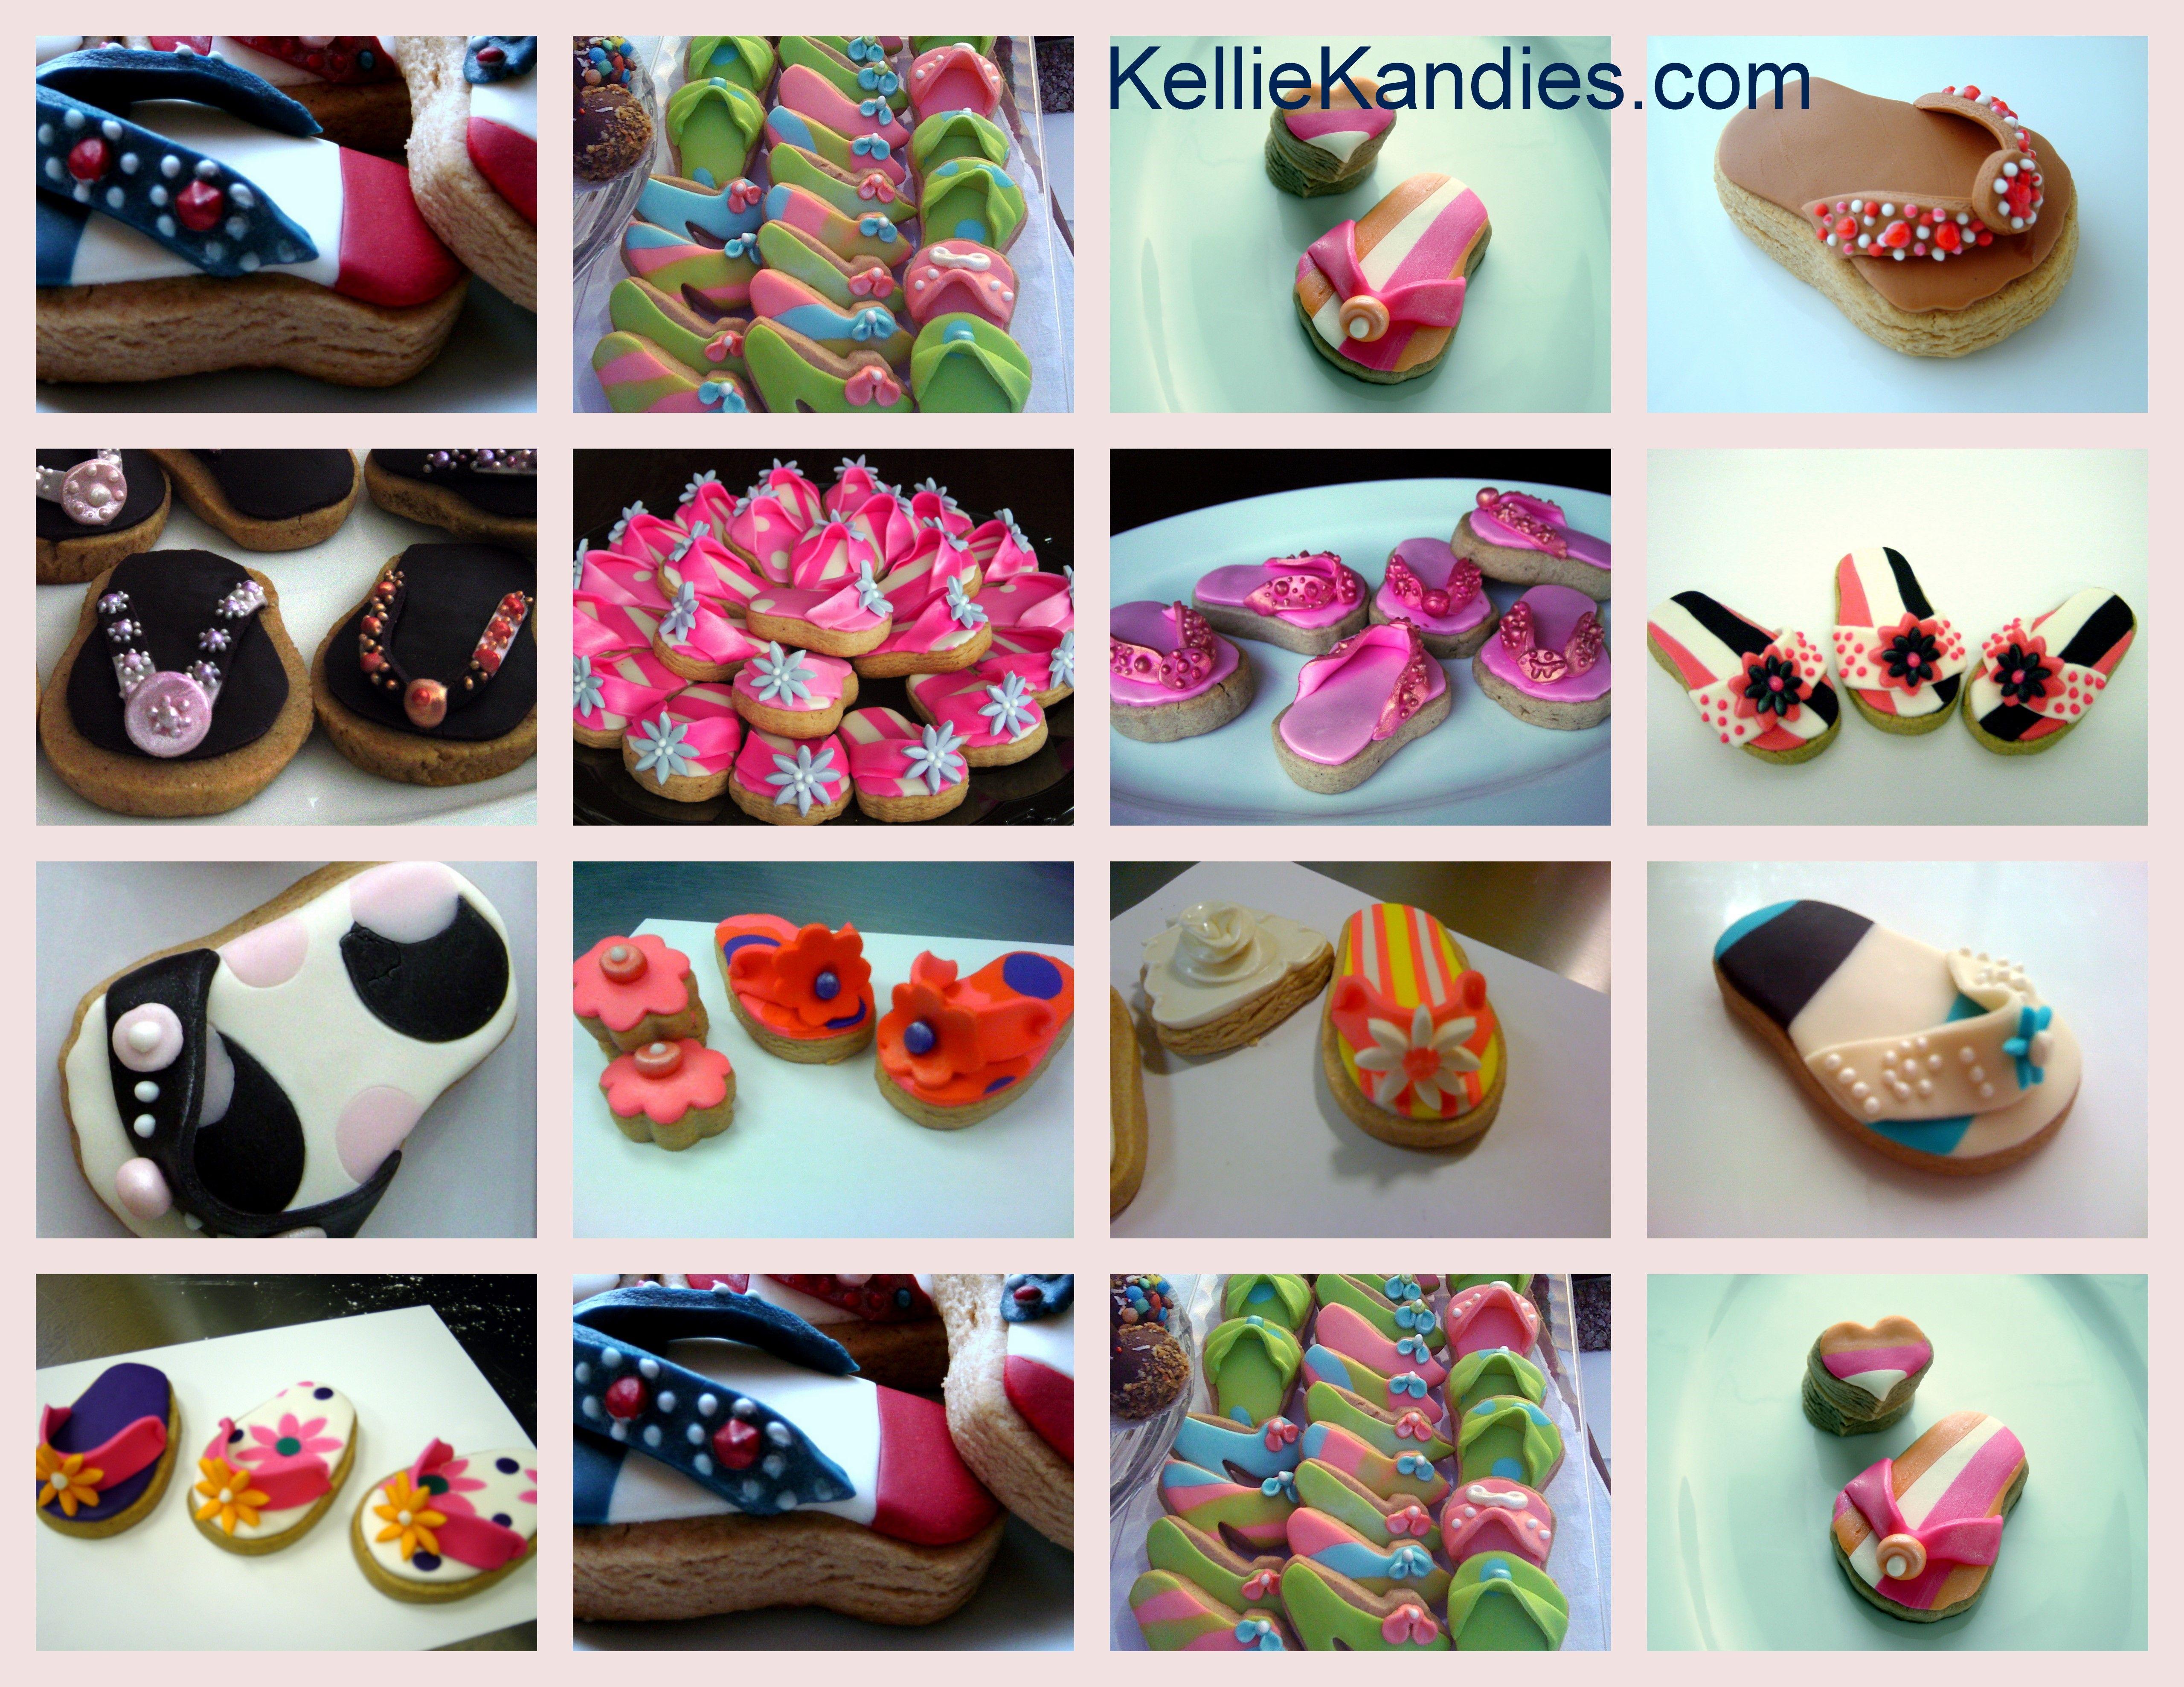 A few of our designer cookies.  kelliekandies.com